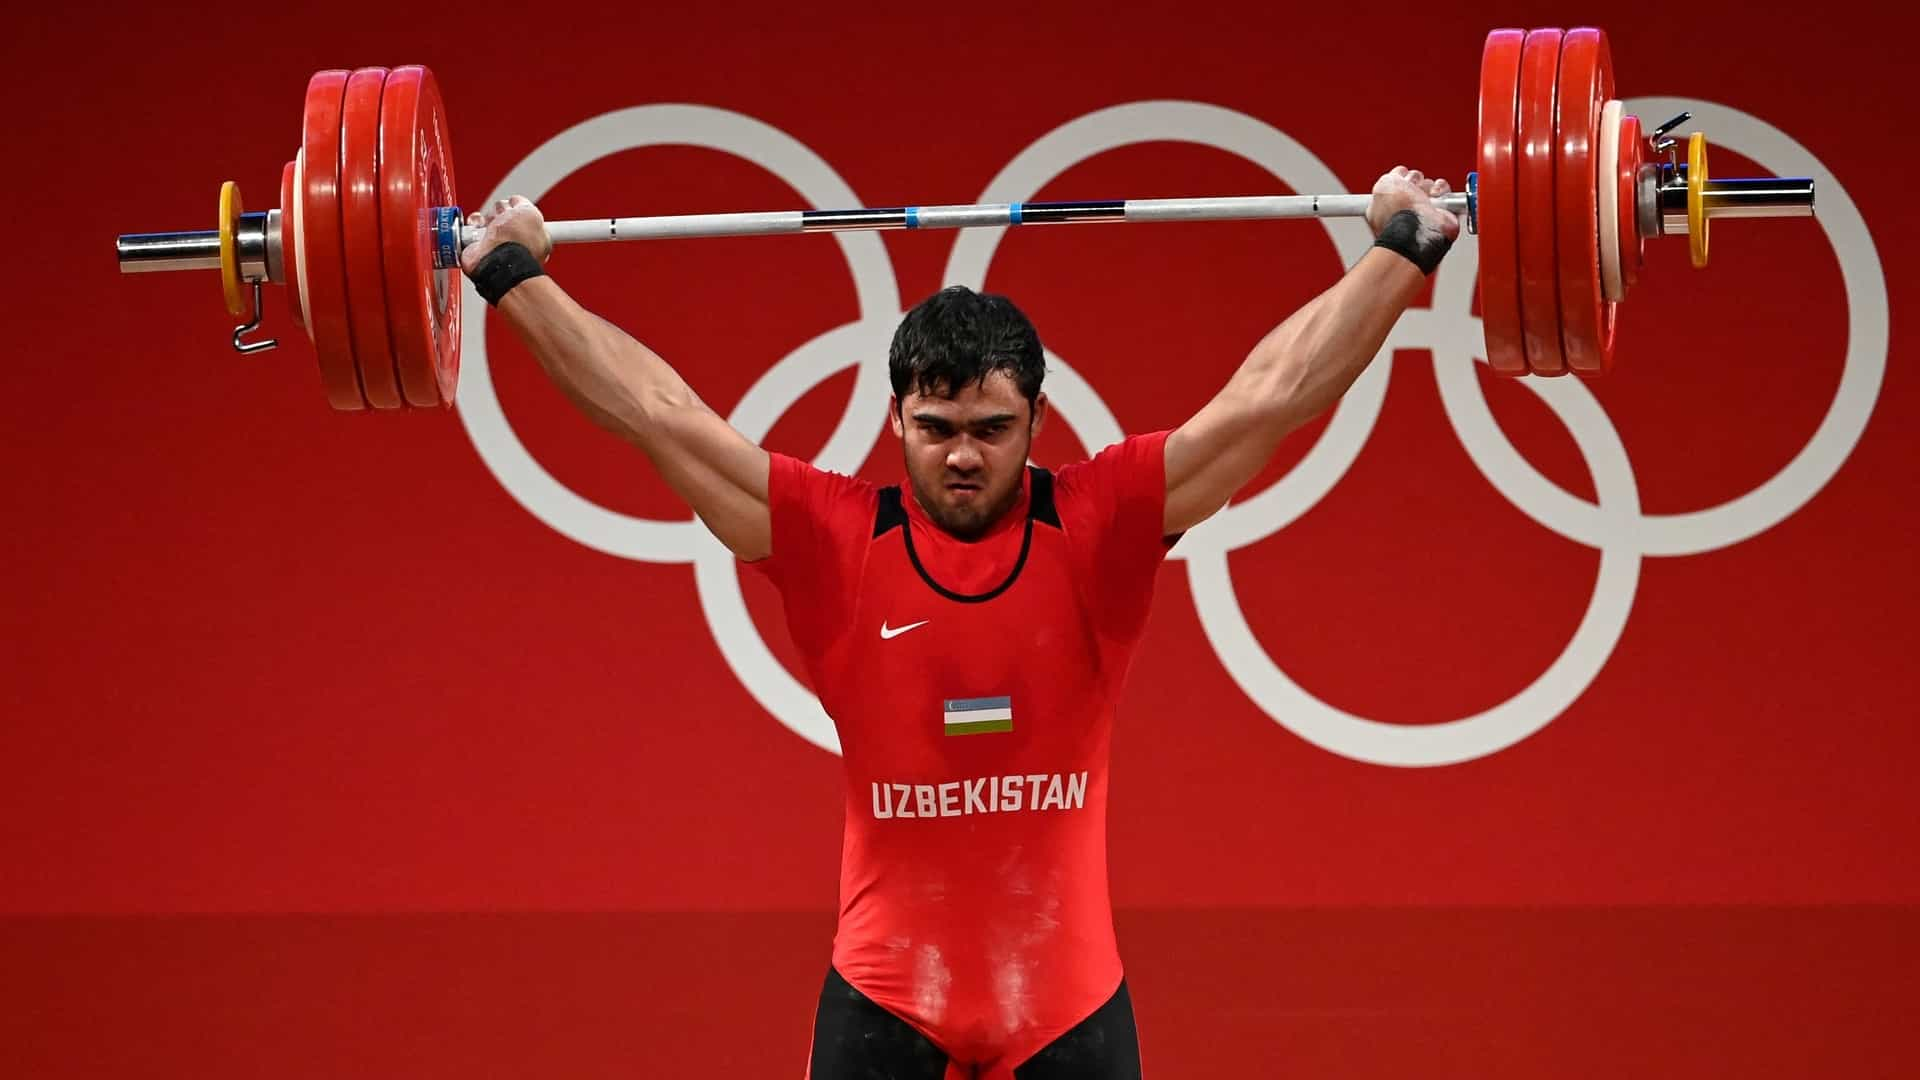 Image for Uzbekistan's Akbar Djuraev wins gold, Olympic records in men's 109 kg